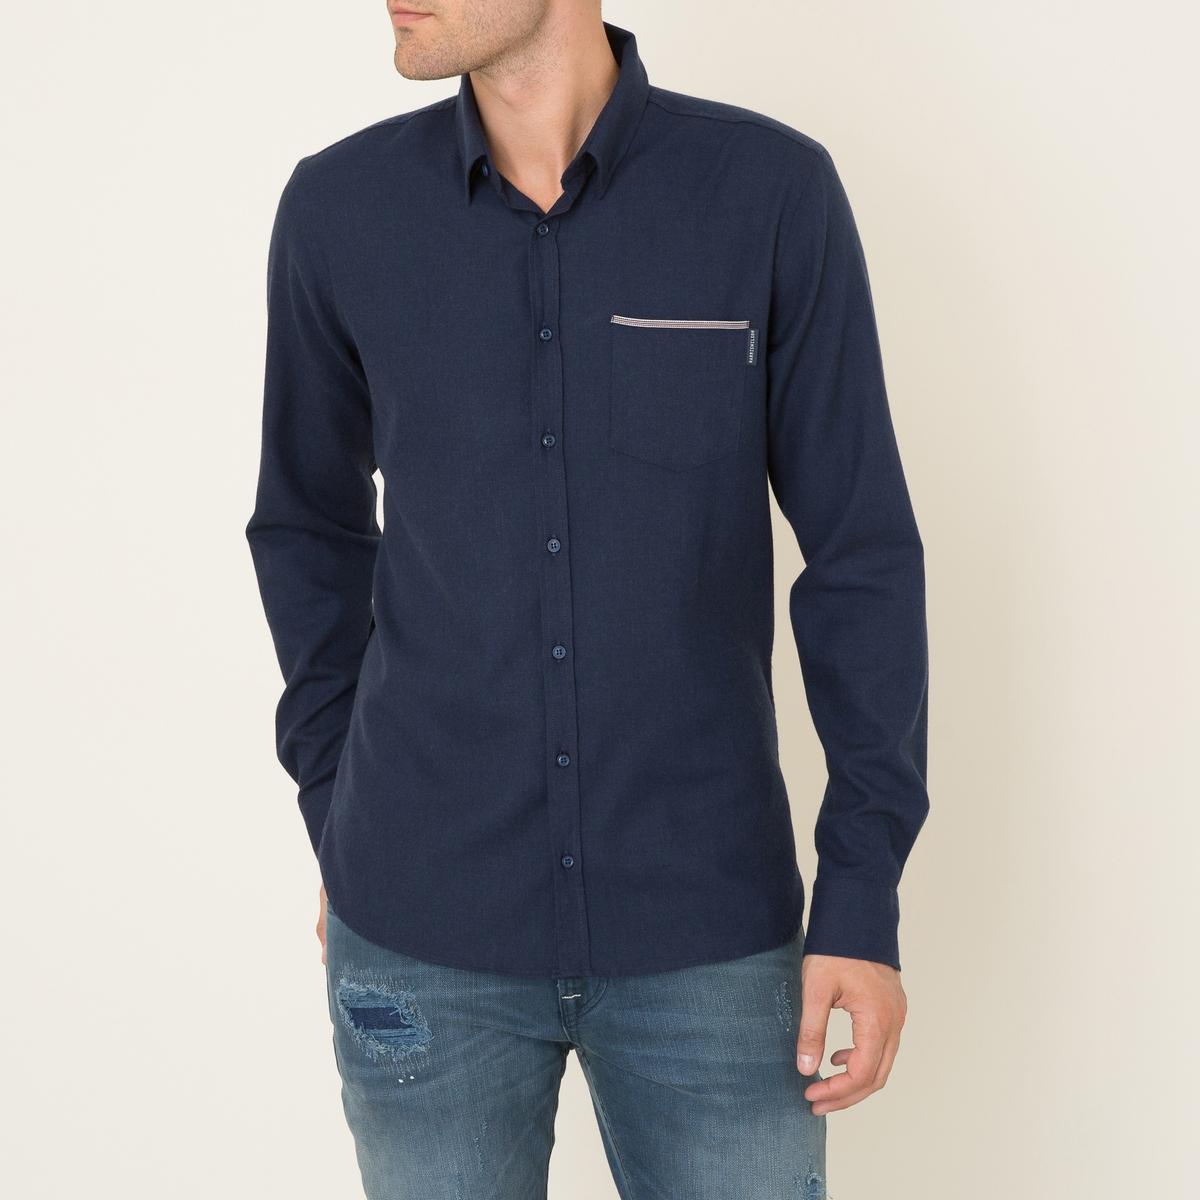 Рубашка OCTAVEСостав и описание Материал : 80% хлопка, 20% шерстиМарка : HARRIS WILSON<br><br>Цвет: темно-синий